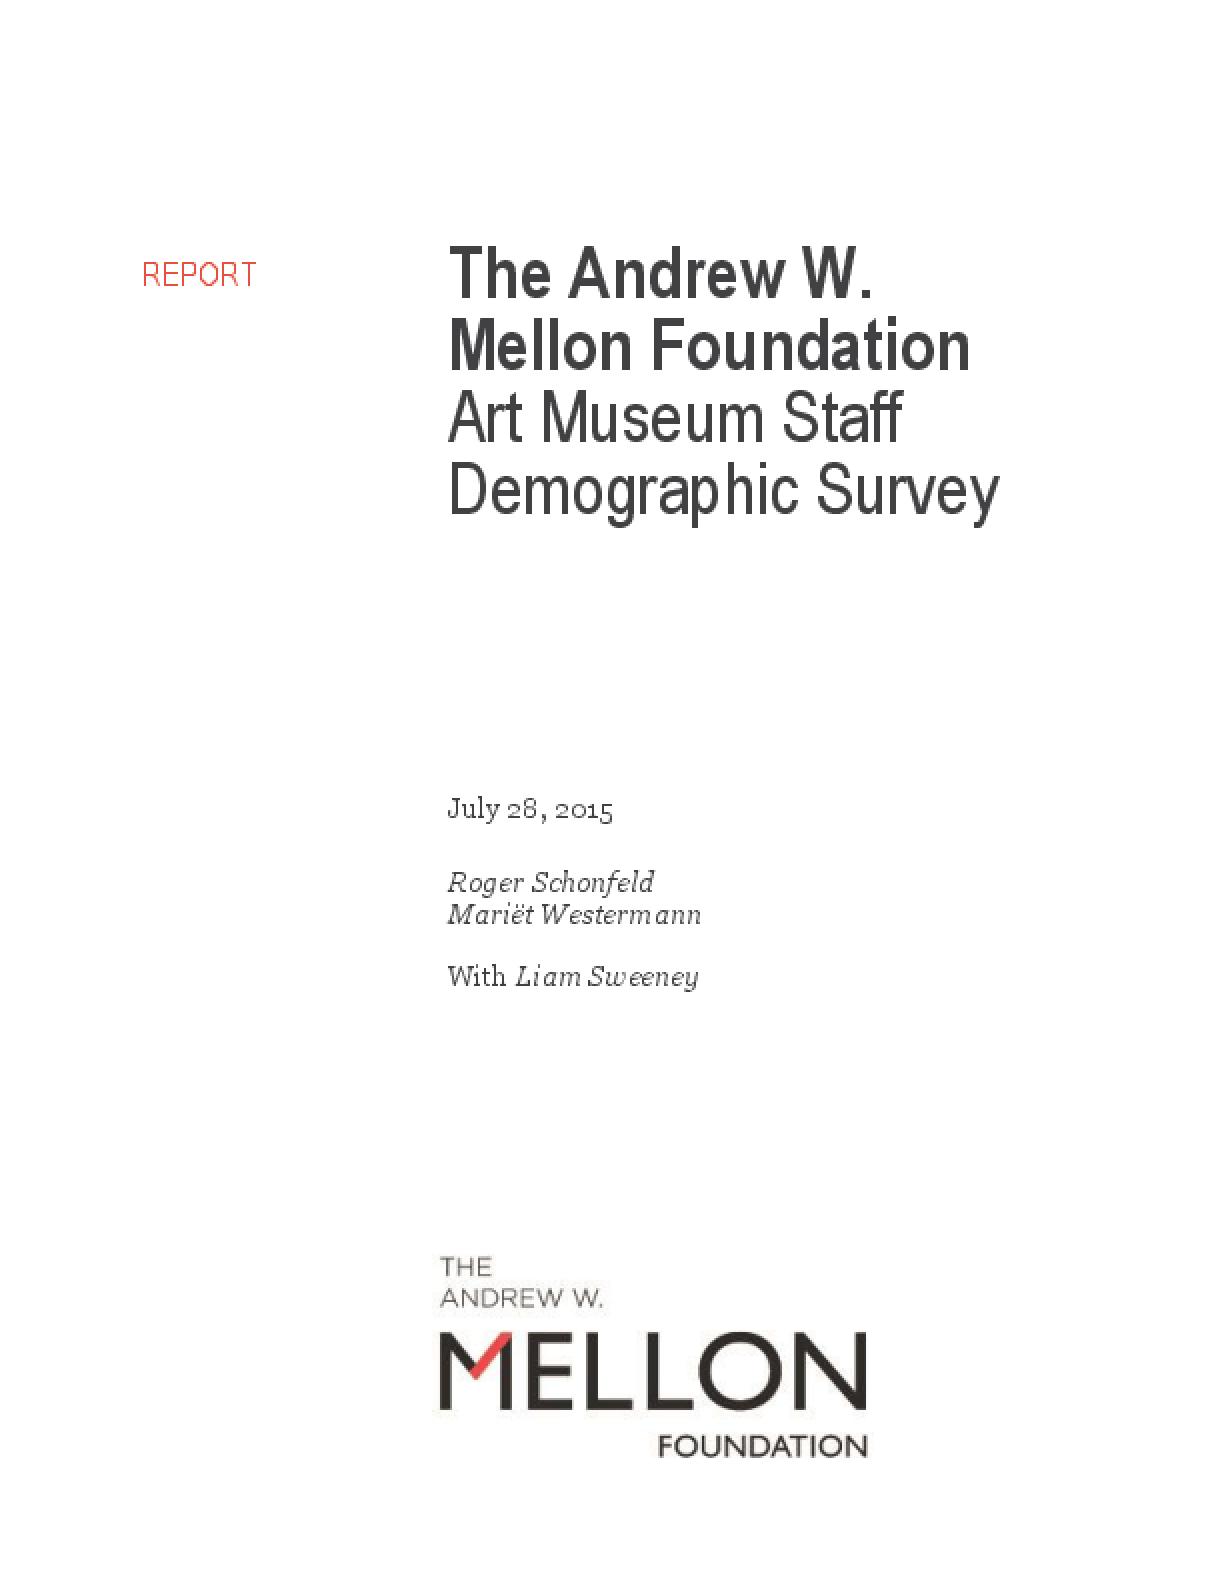 The Andrew W. Mellon Foundation Art Museum Staff Demographic Survey